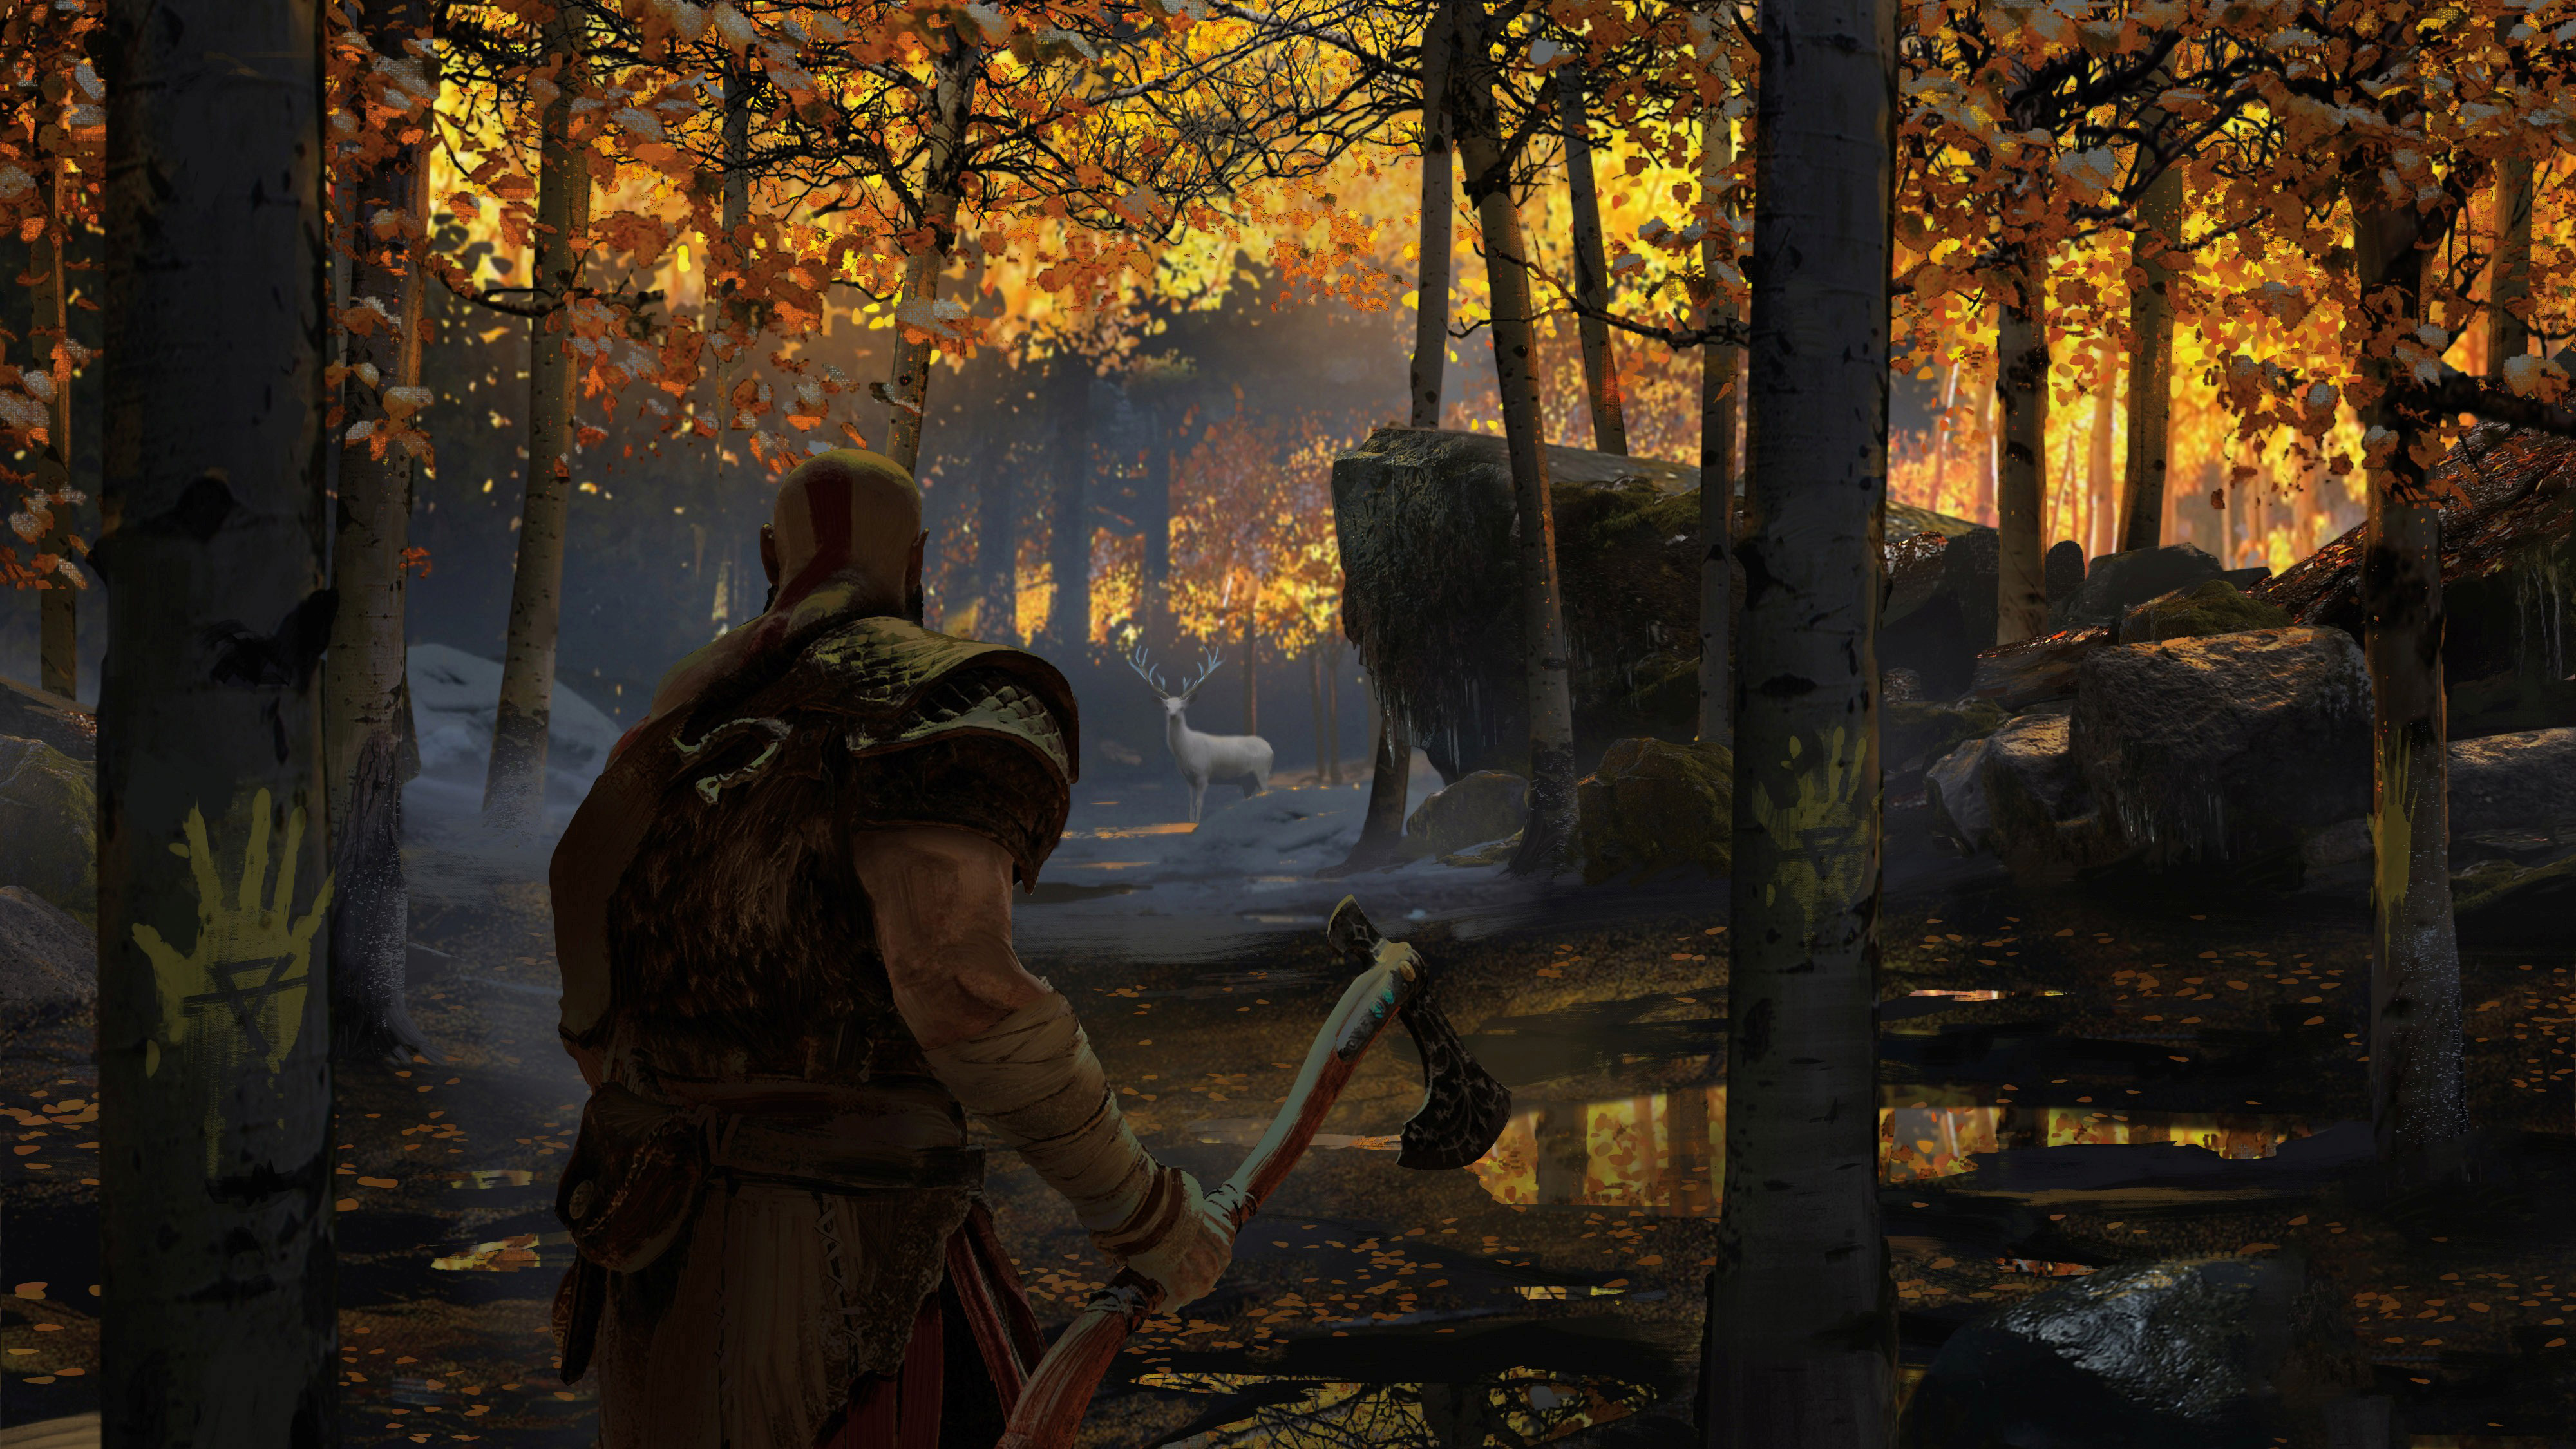 4k God Of War Concept Art, HD Games, 4k Wallpapers, Images ...